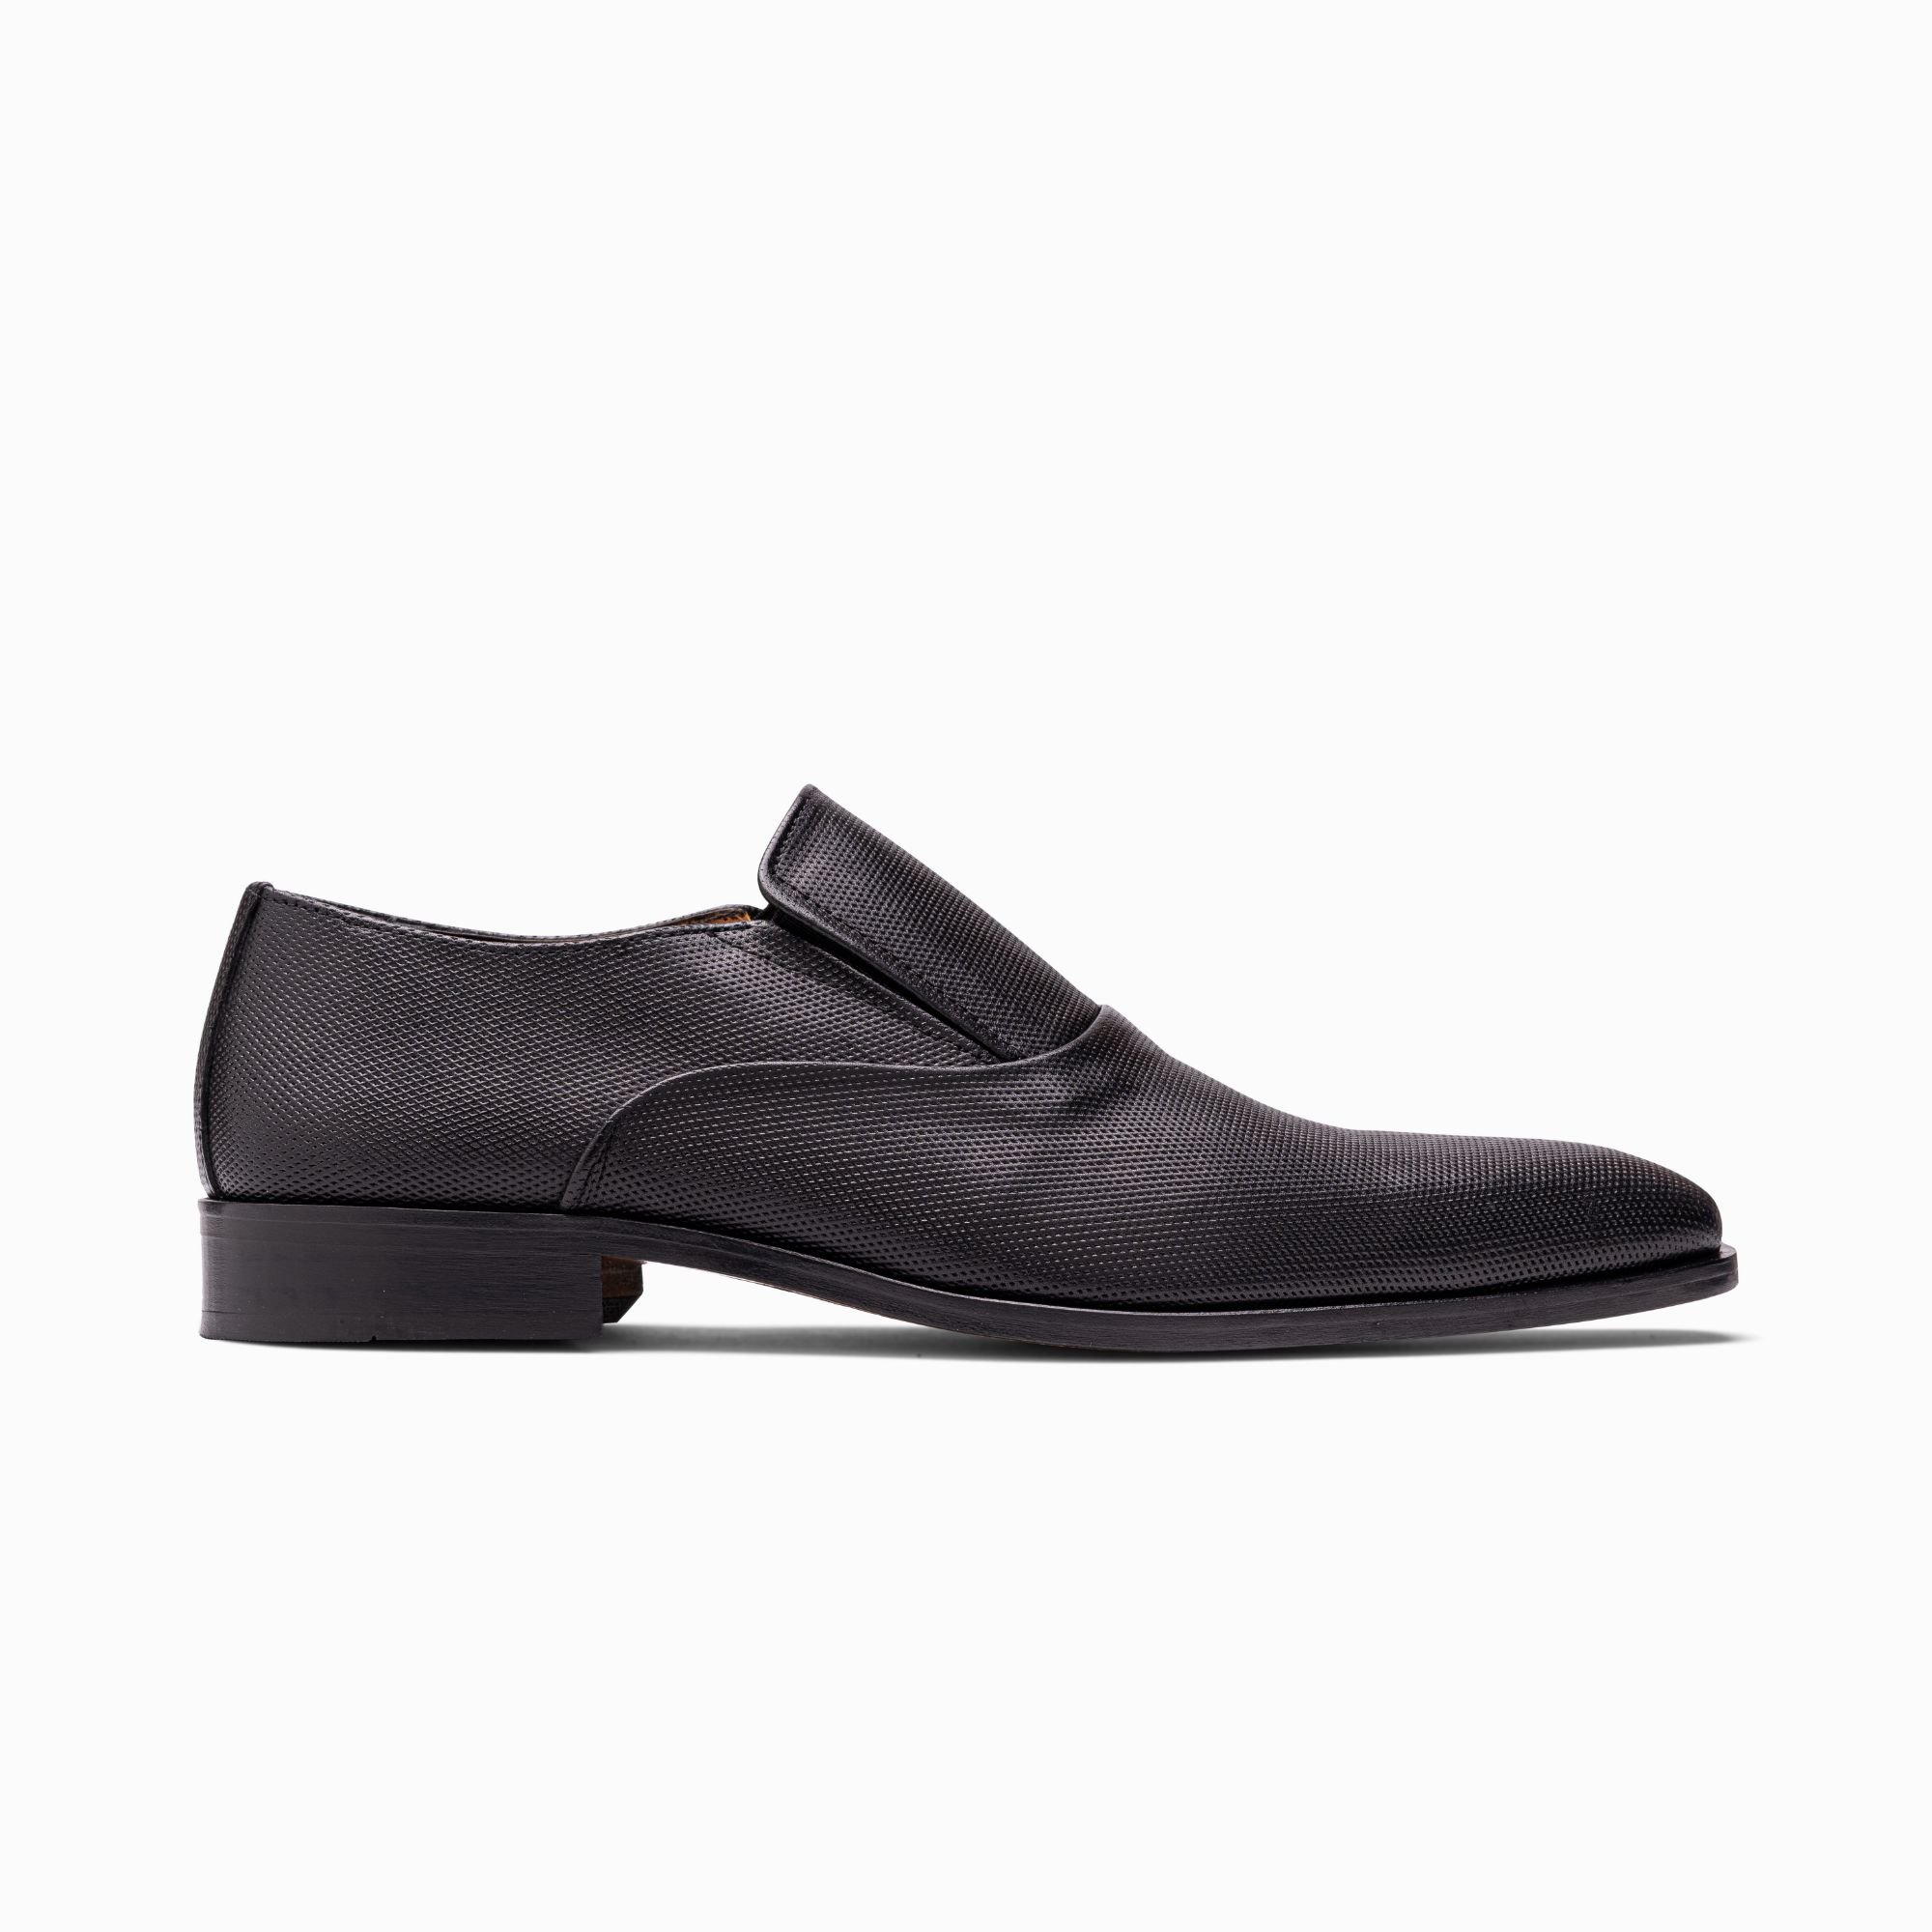 1301b-black-mat-leather